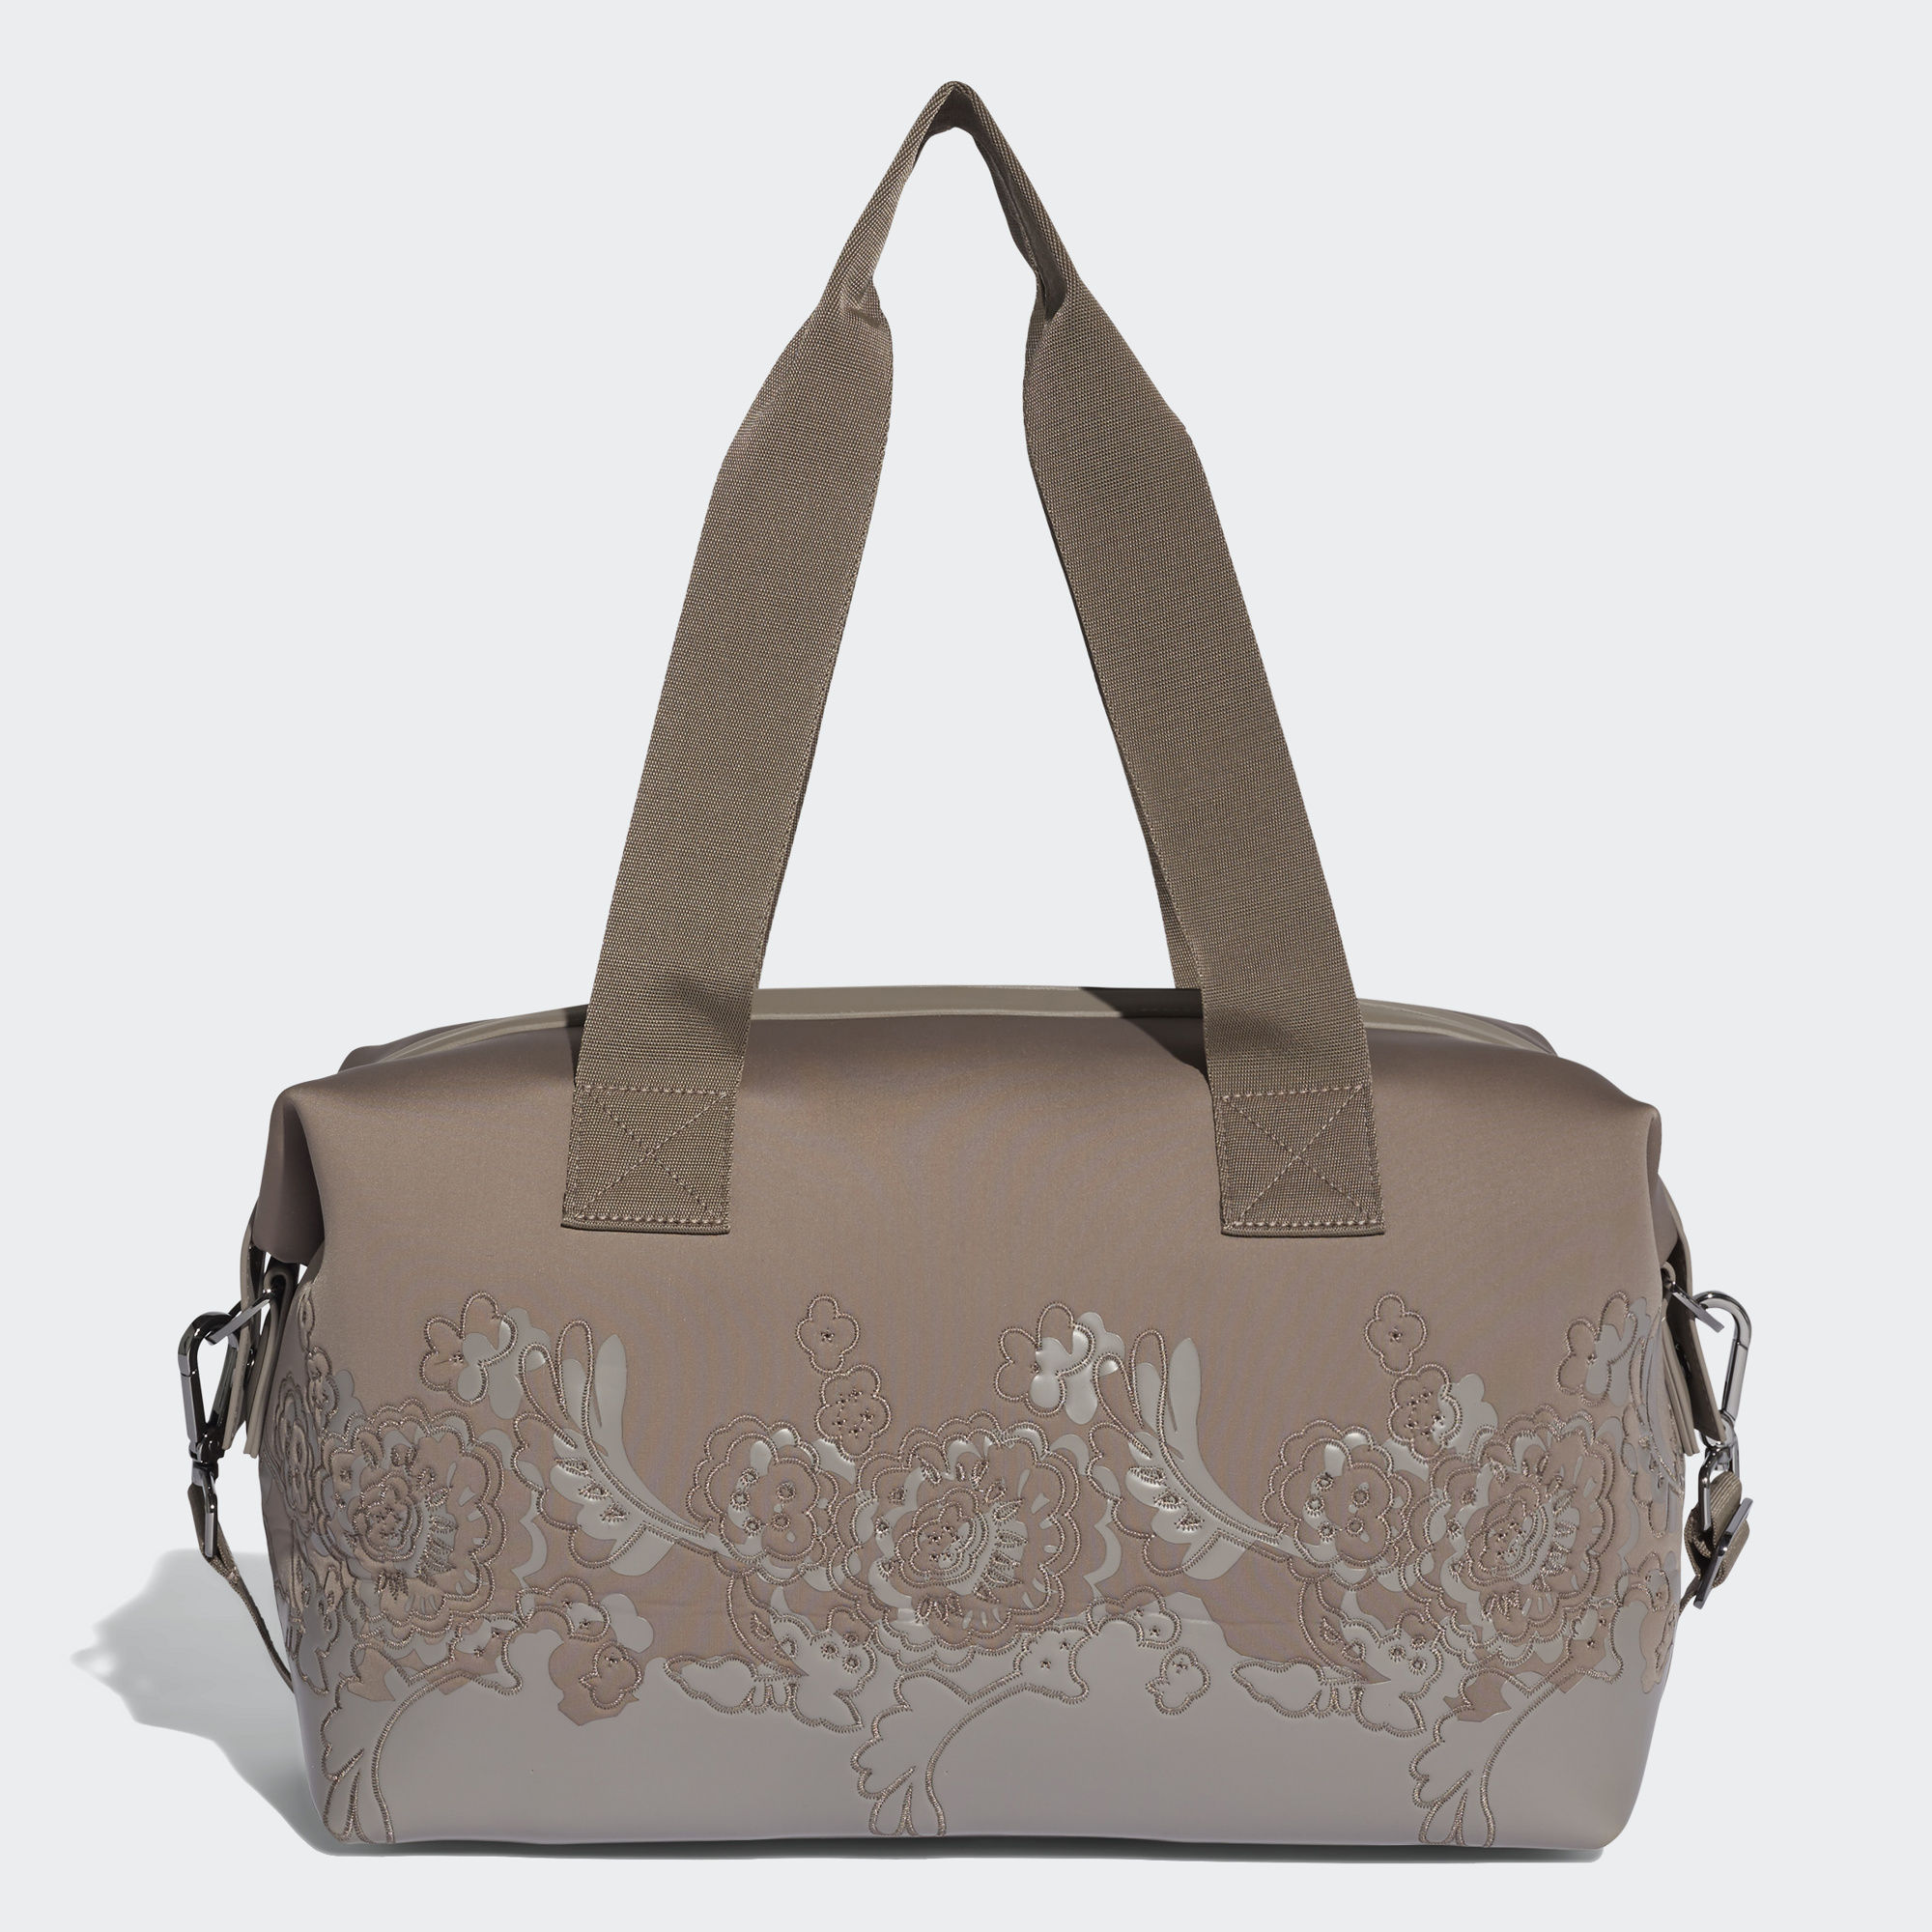 04cc8b01daa5 Спортивная сумка Studio DP2650 Stella McCartney adidas - Украина |  ONETEAM.COM.UA